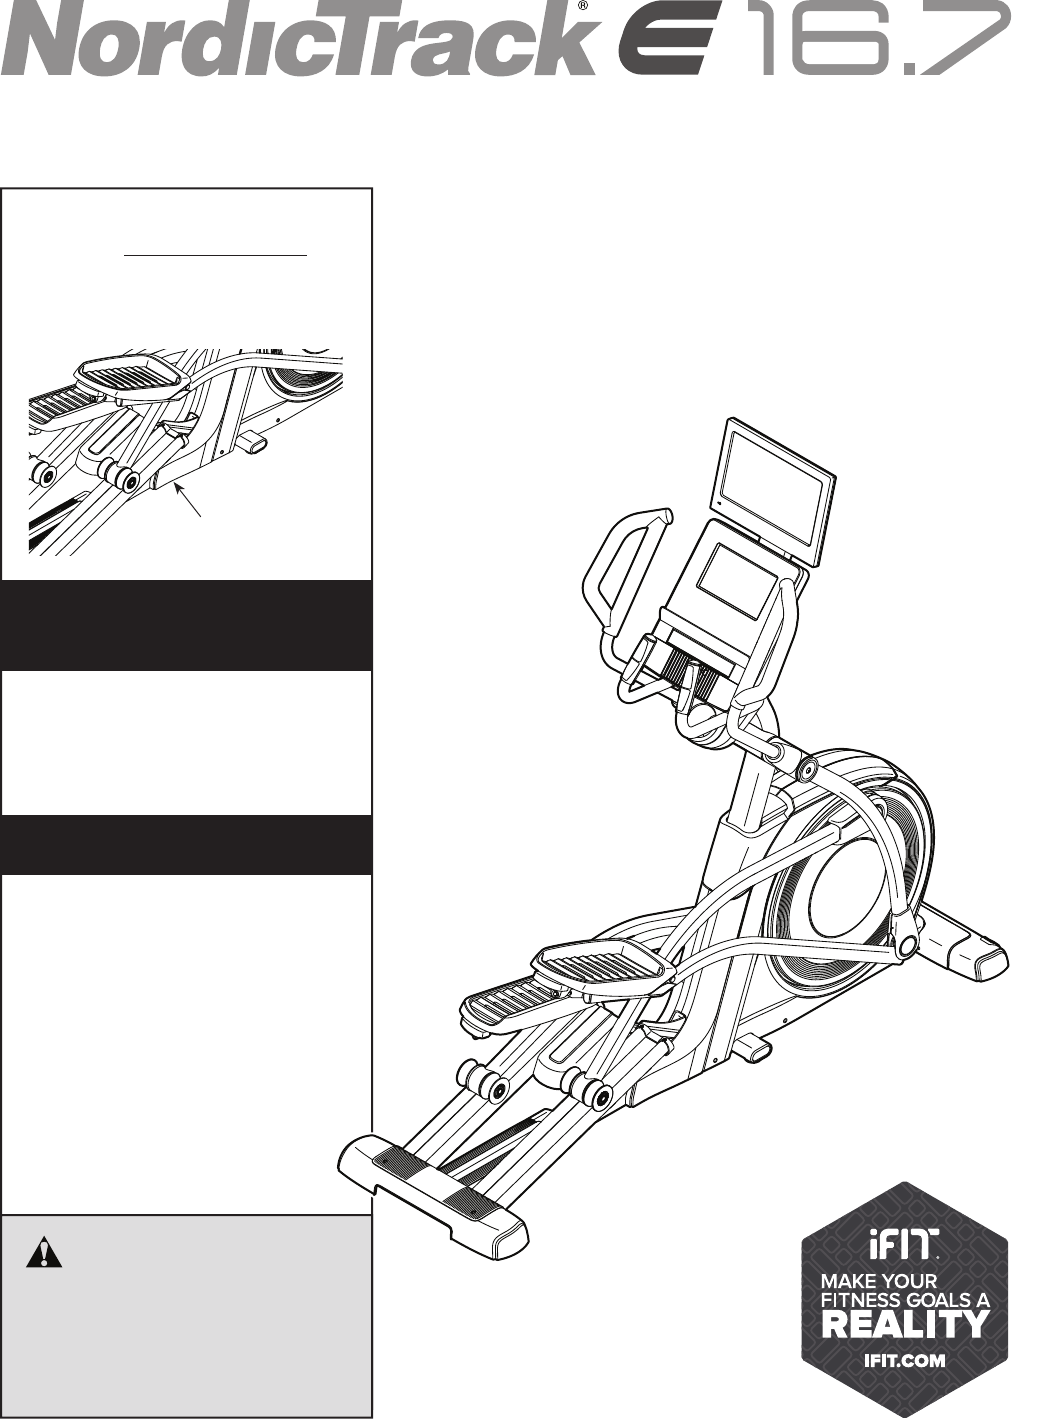 Nordic Track Ntel160130 Owner S Manual Nordictrack Wiring Diagram